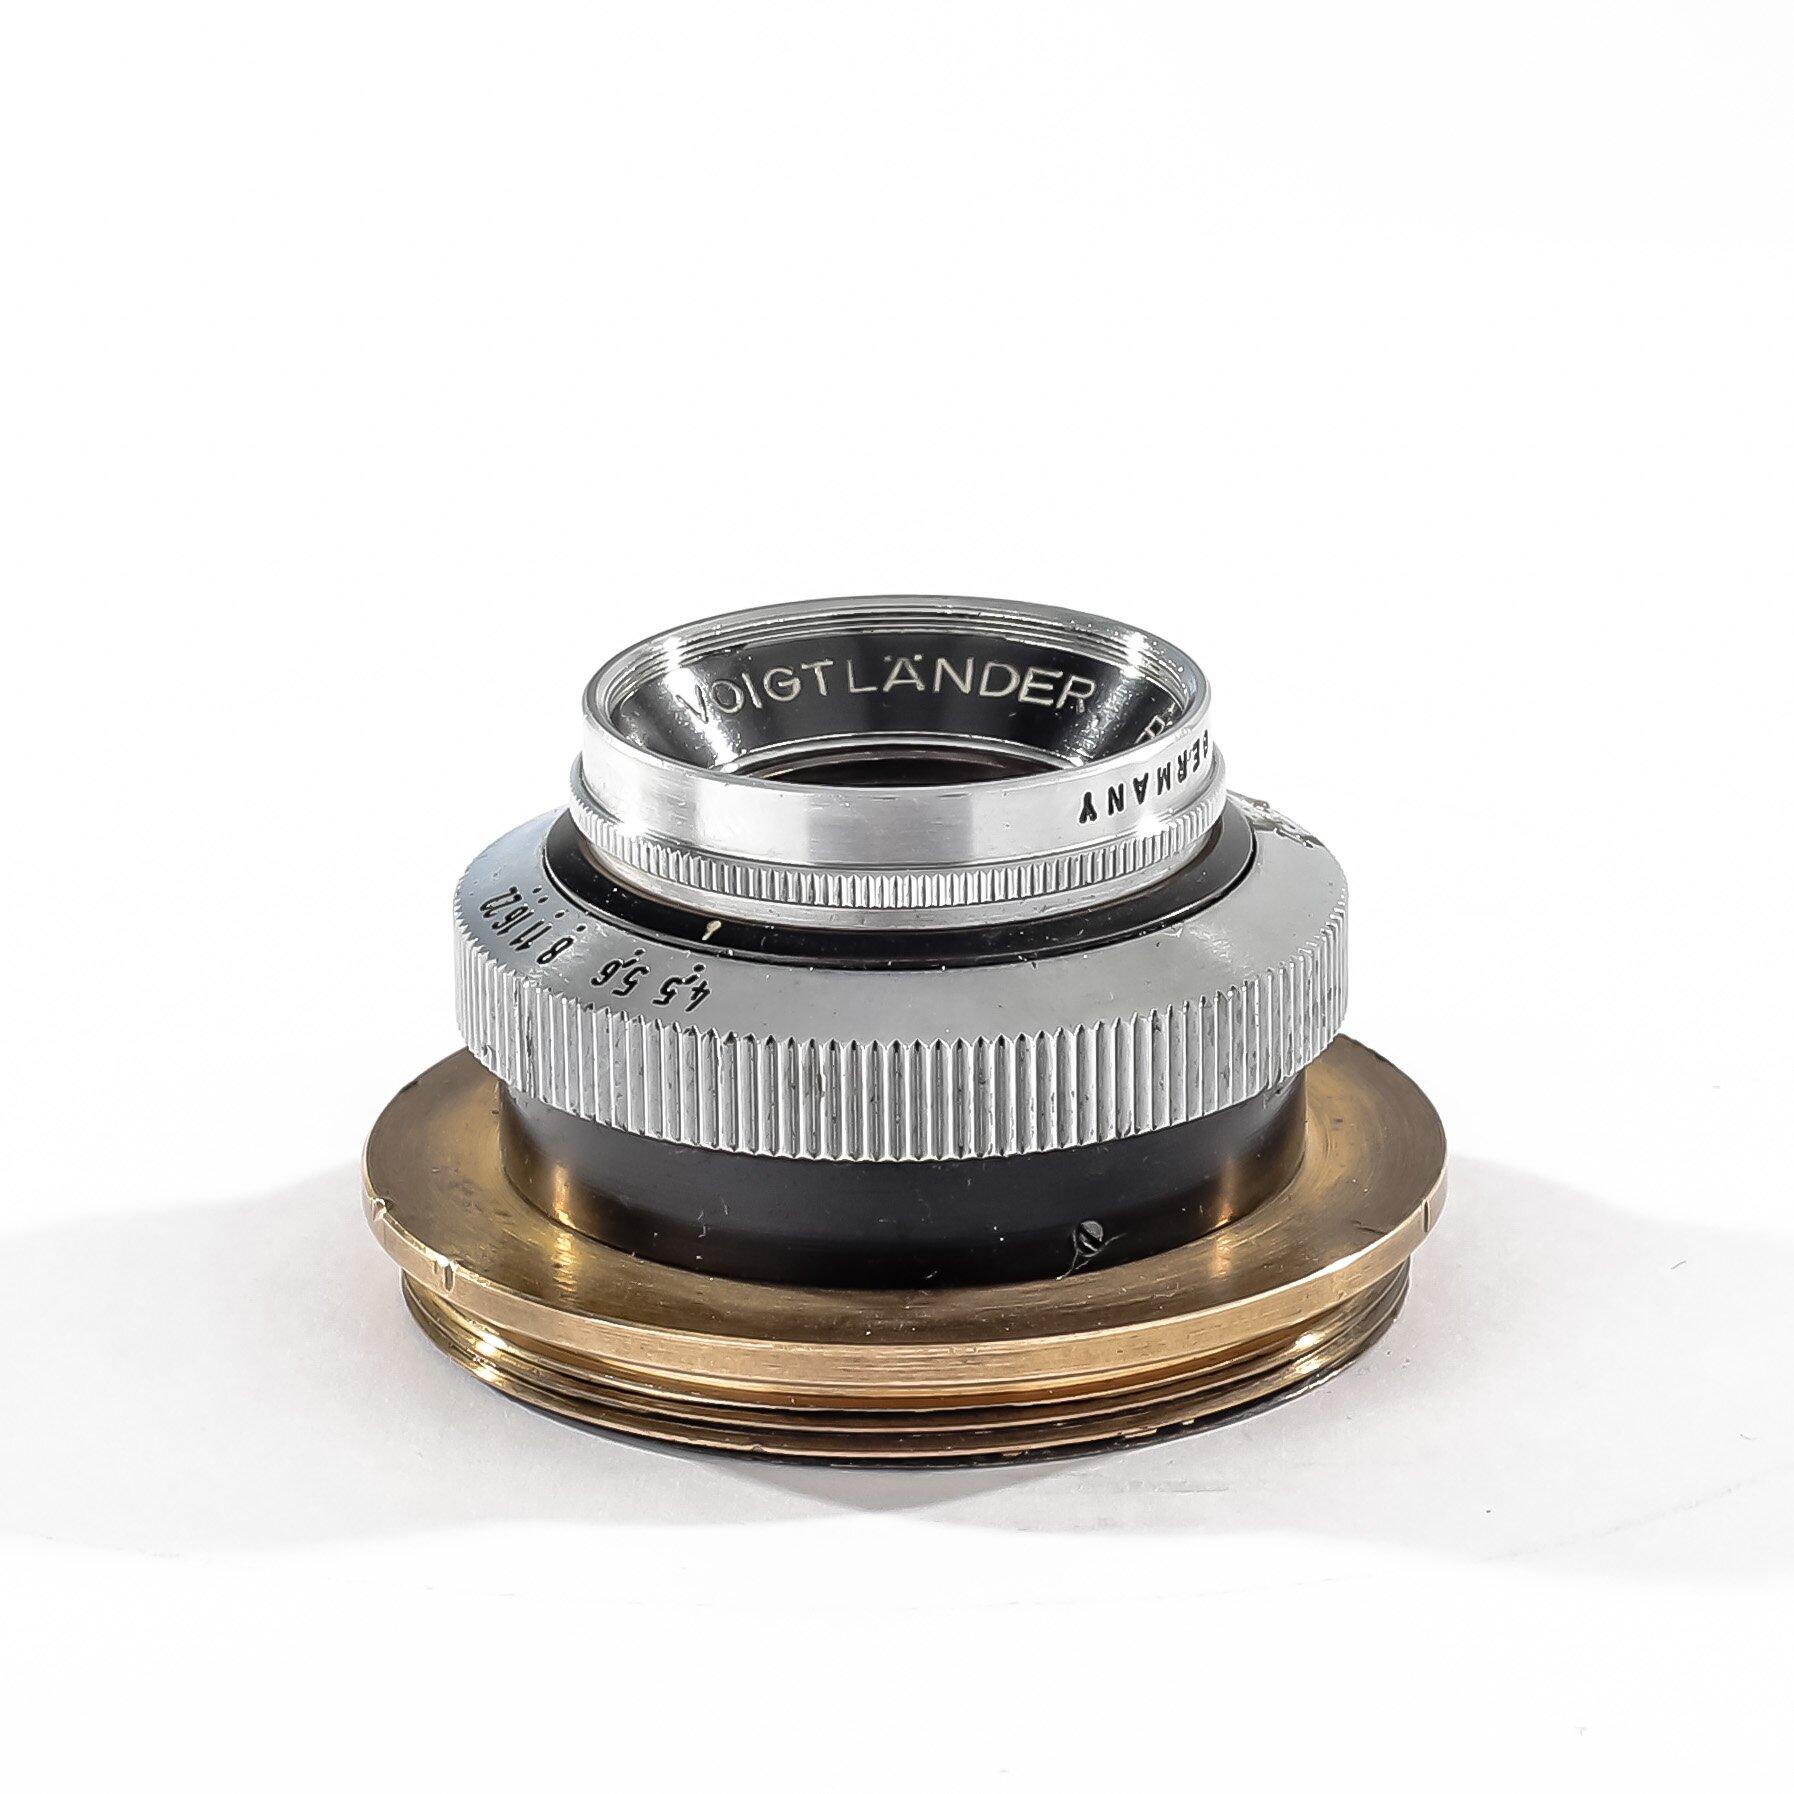 Prototype Voigtländer 4,5/60mm Repro-Skopar für Leica M39 very rare selten